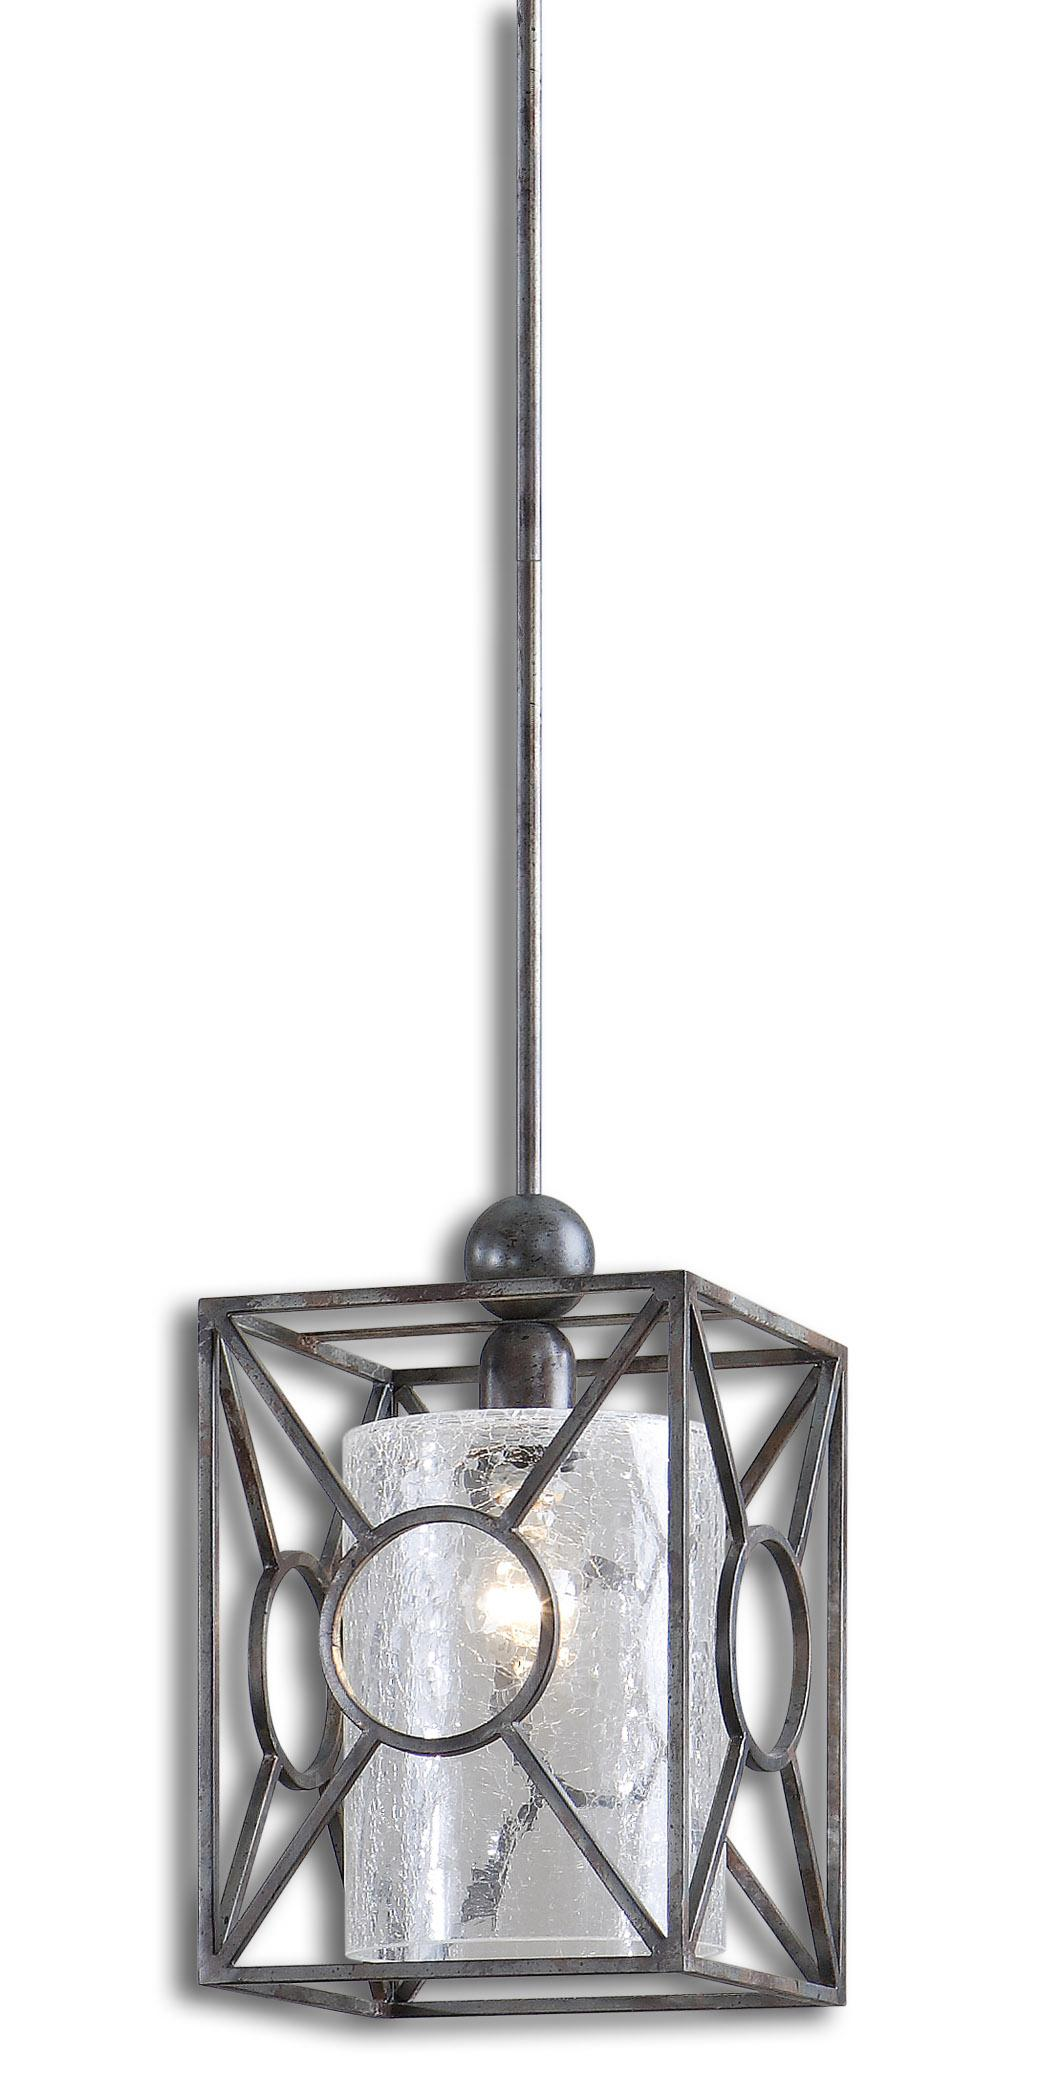 Uttermost Lighting Fixtures Arbela 1 Light Mini Pendant - Item Number: 21978